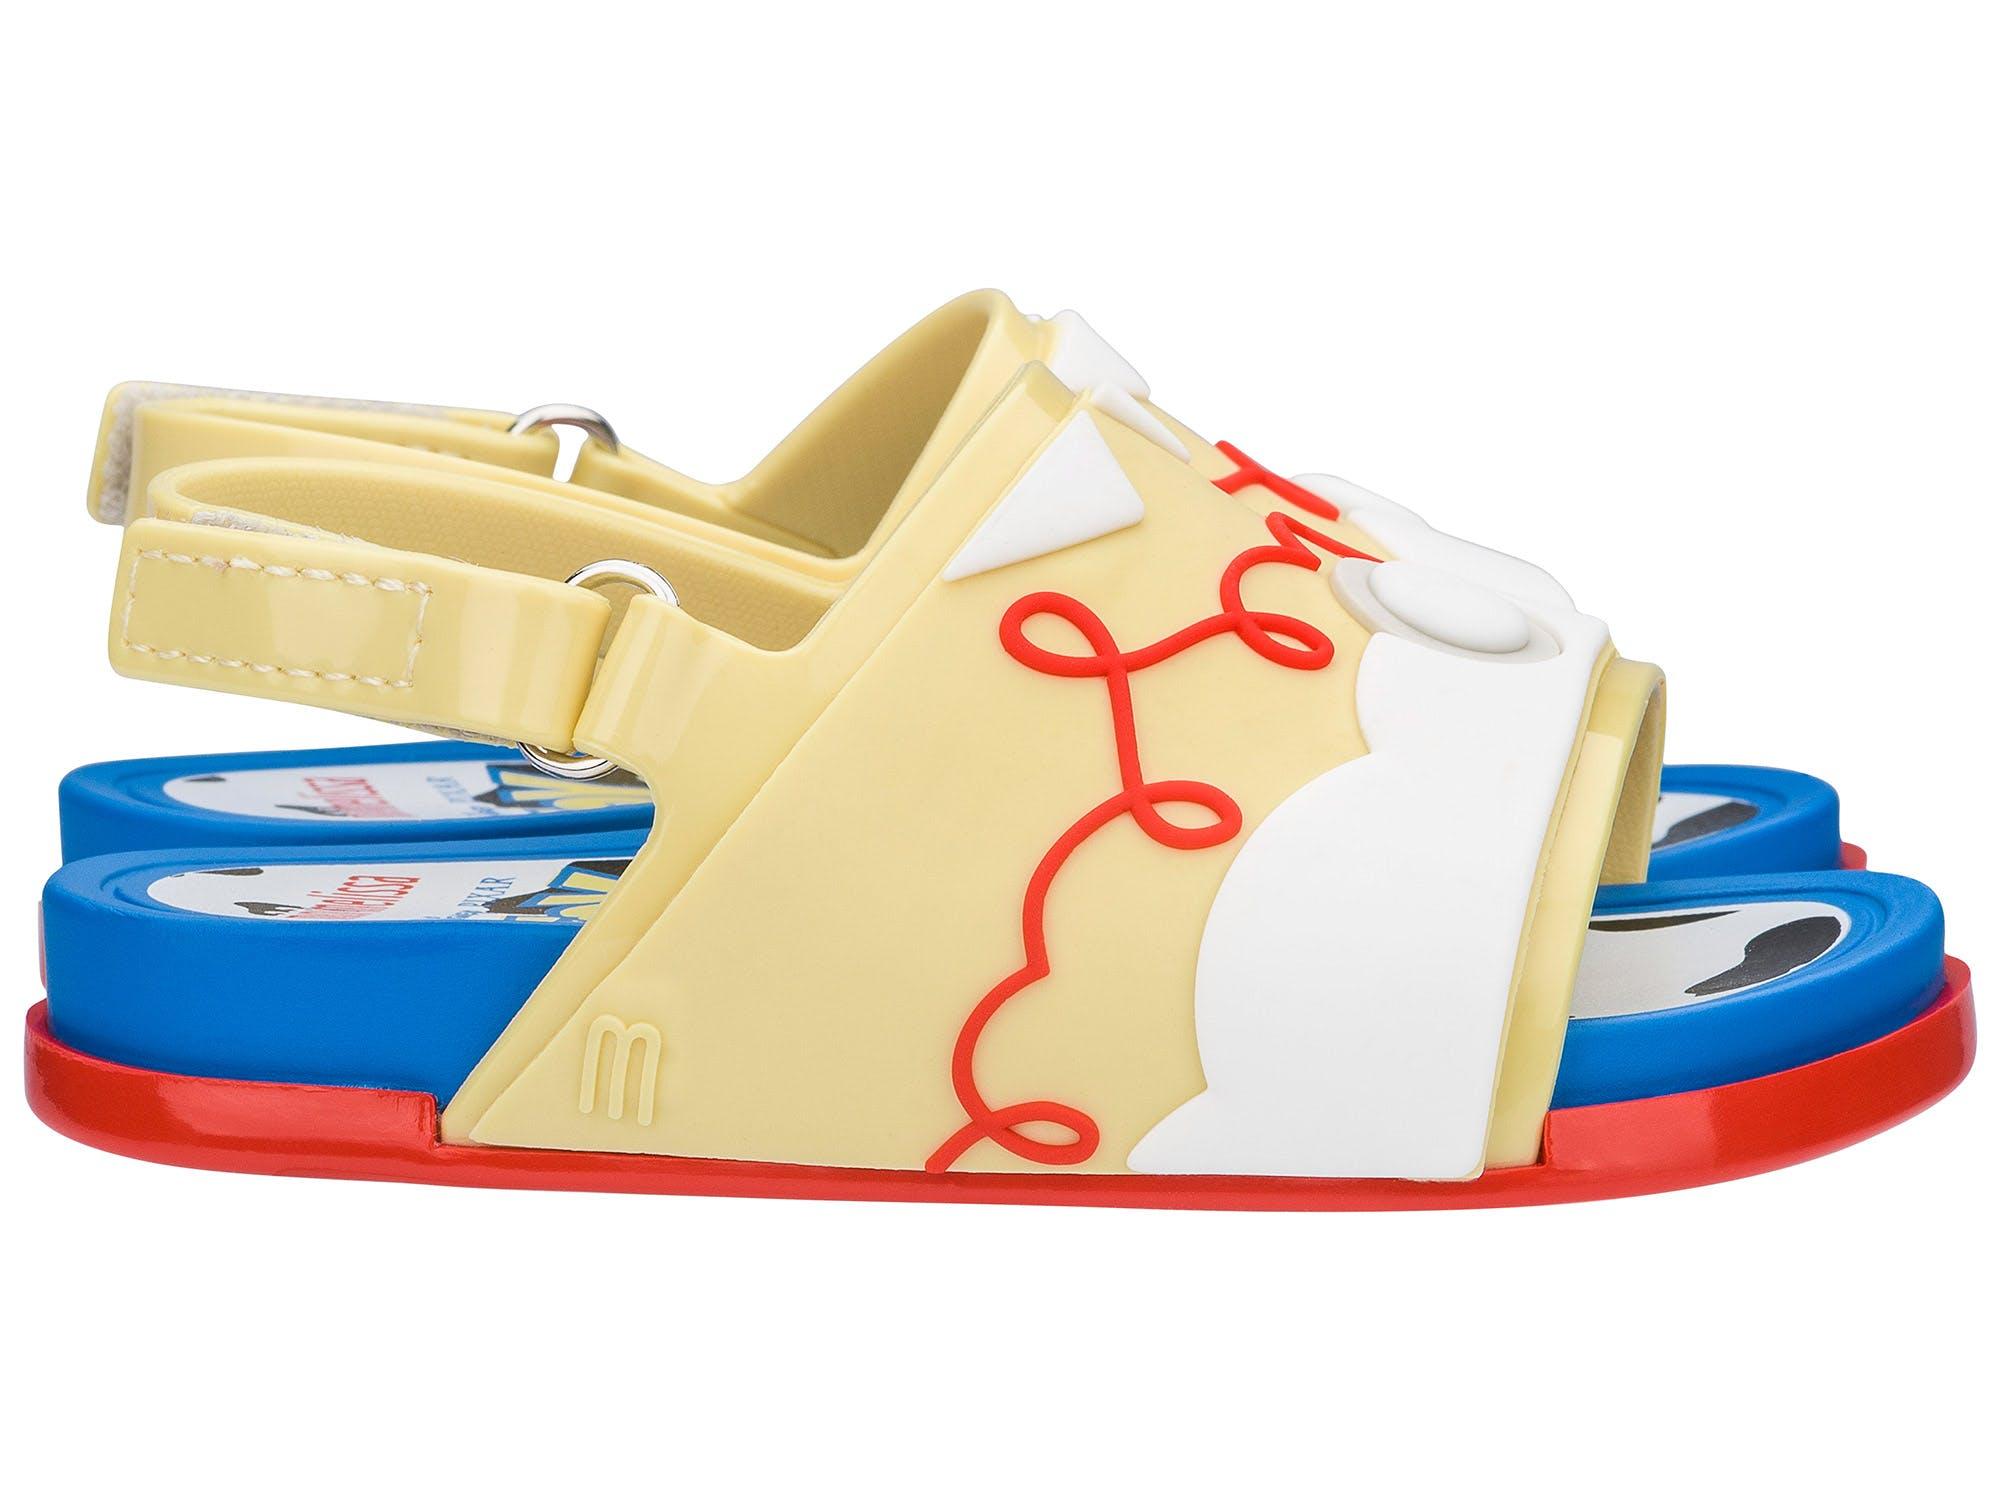 Mini Melissa Beach Slide + Toy Story Azul/Amarela/Vermelha